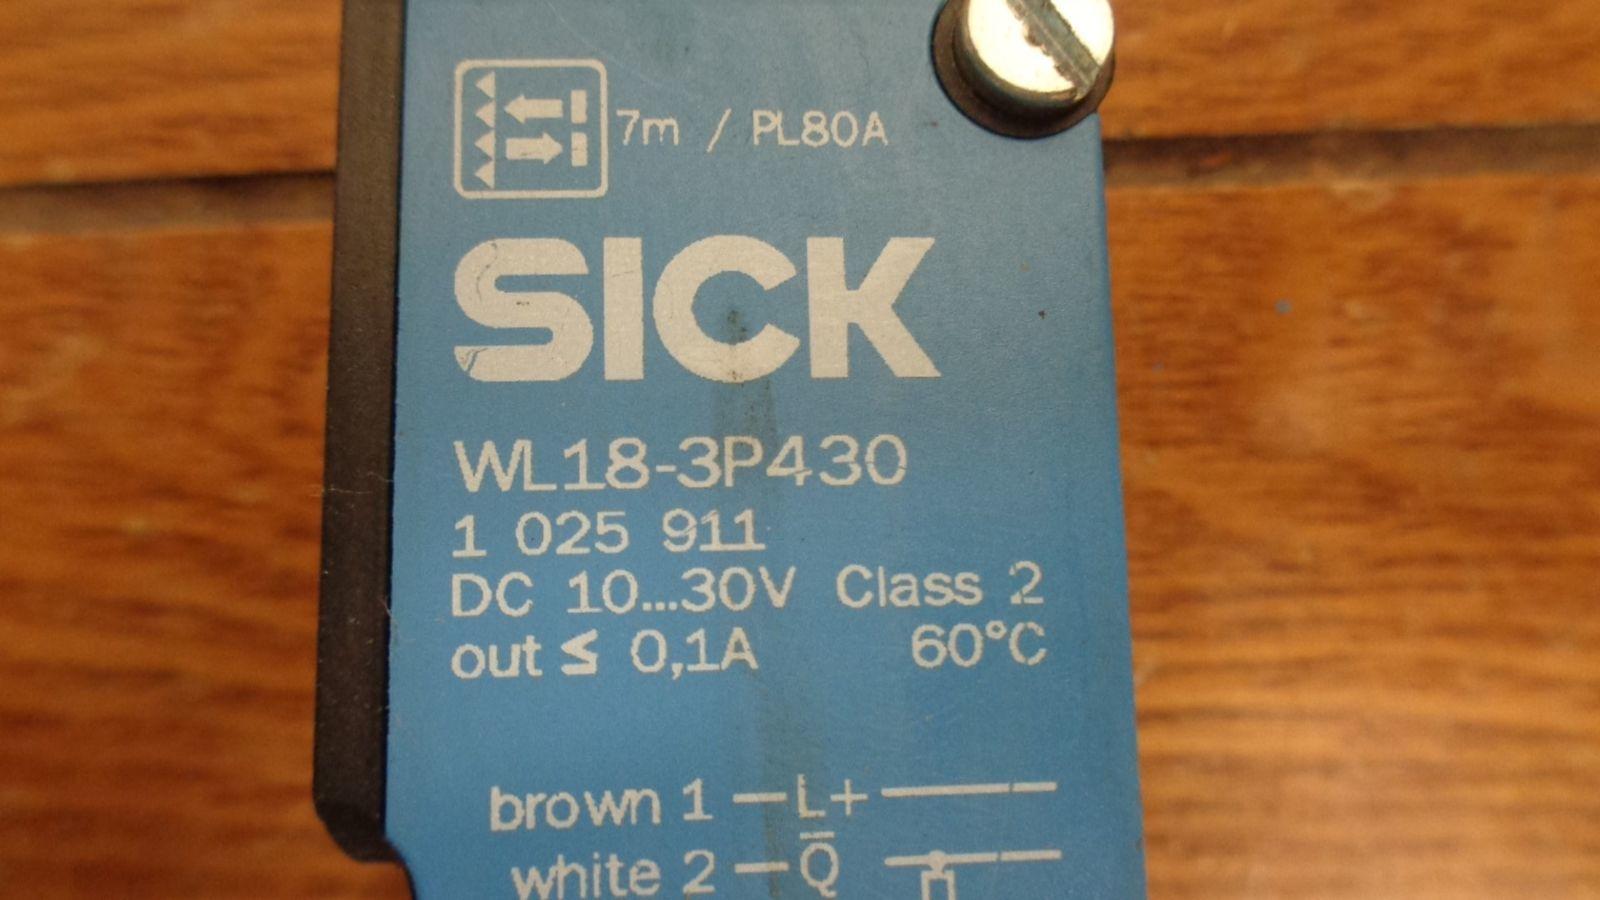 Wiring Diagram E3a2 Photoelectric Switch Page 2 Sick E3jm Automotive Block Source Wl18 3p430 Sensor Retro Reflective 10 30v